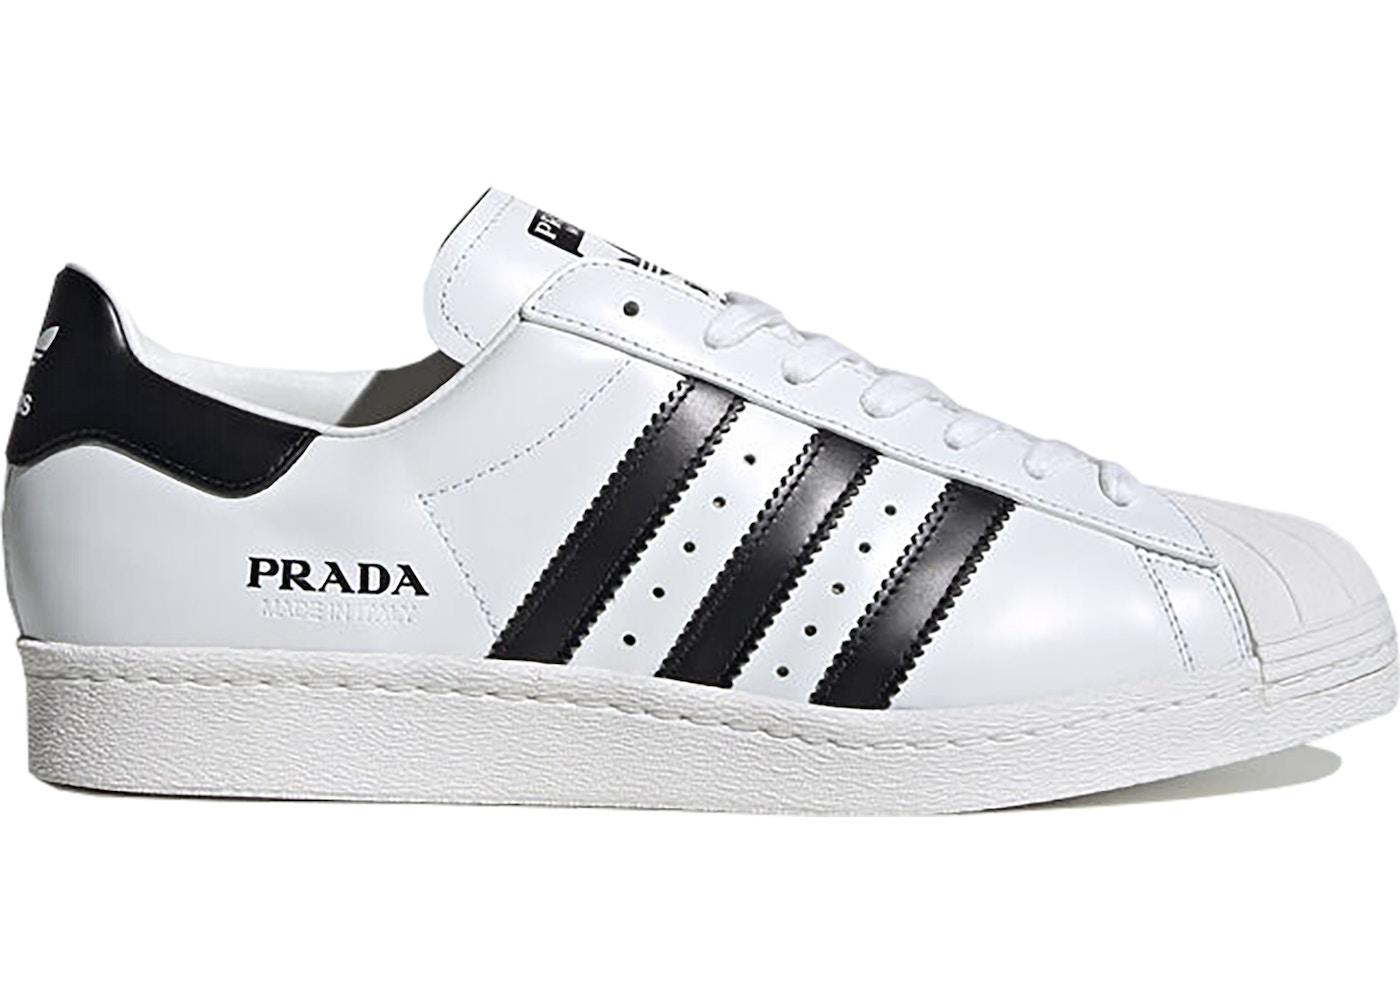 adidas Superstar Prada White Black - FW6680